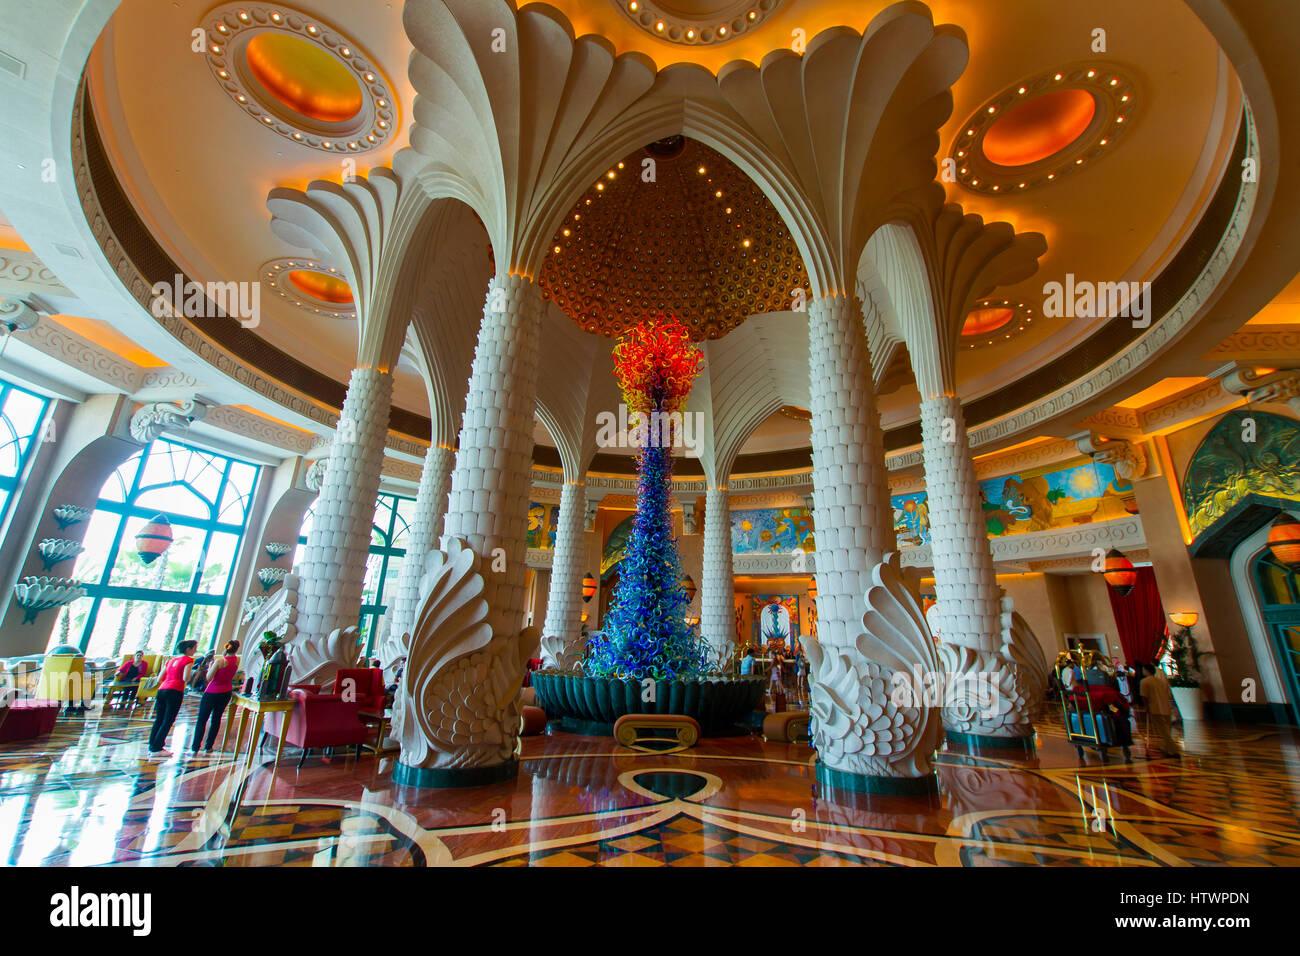 Entrance Hall. Atlantis, The Palm Hotel. Palm Jumeirah. Dubai city.  Dubai. United Arab Emirates. - Stock Image